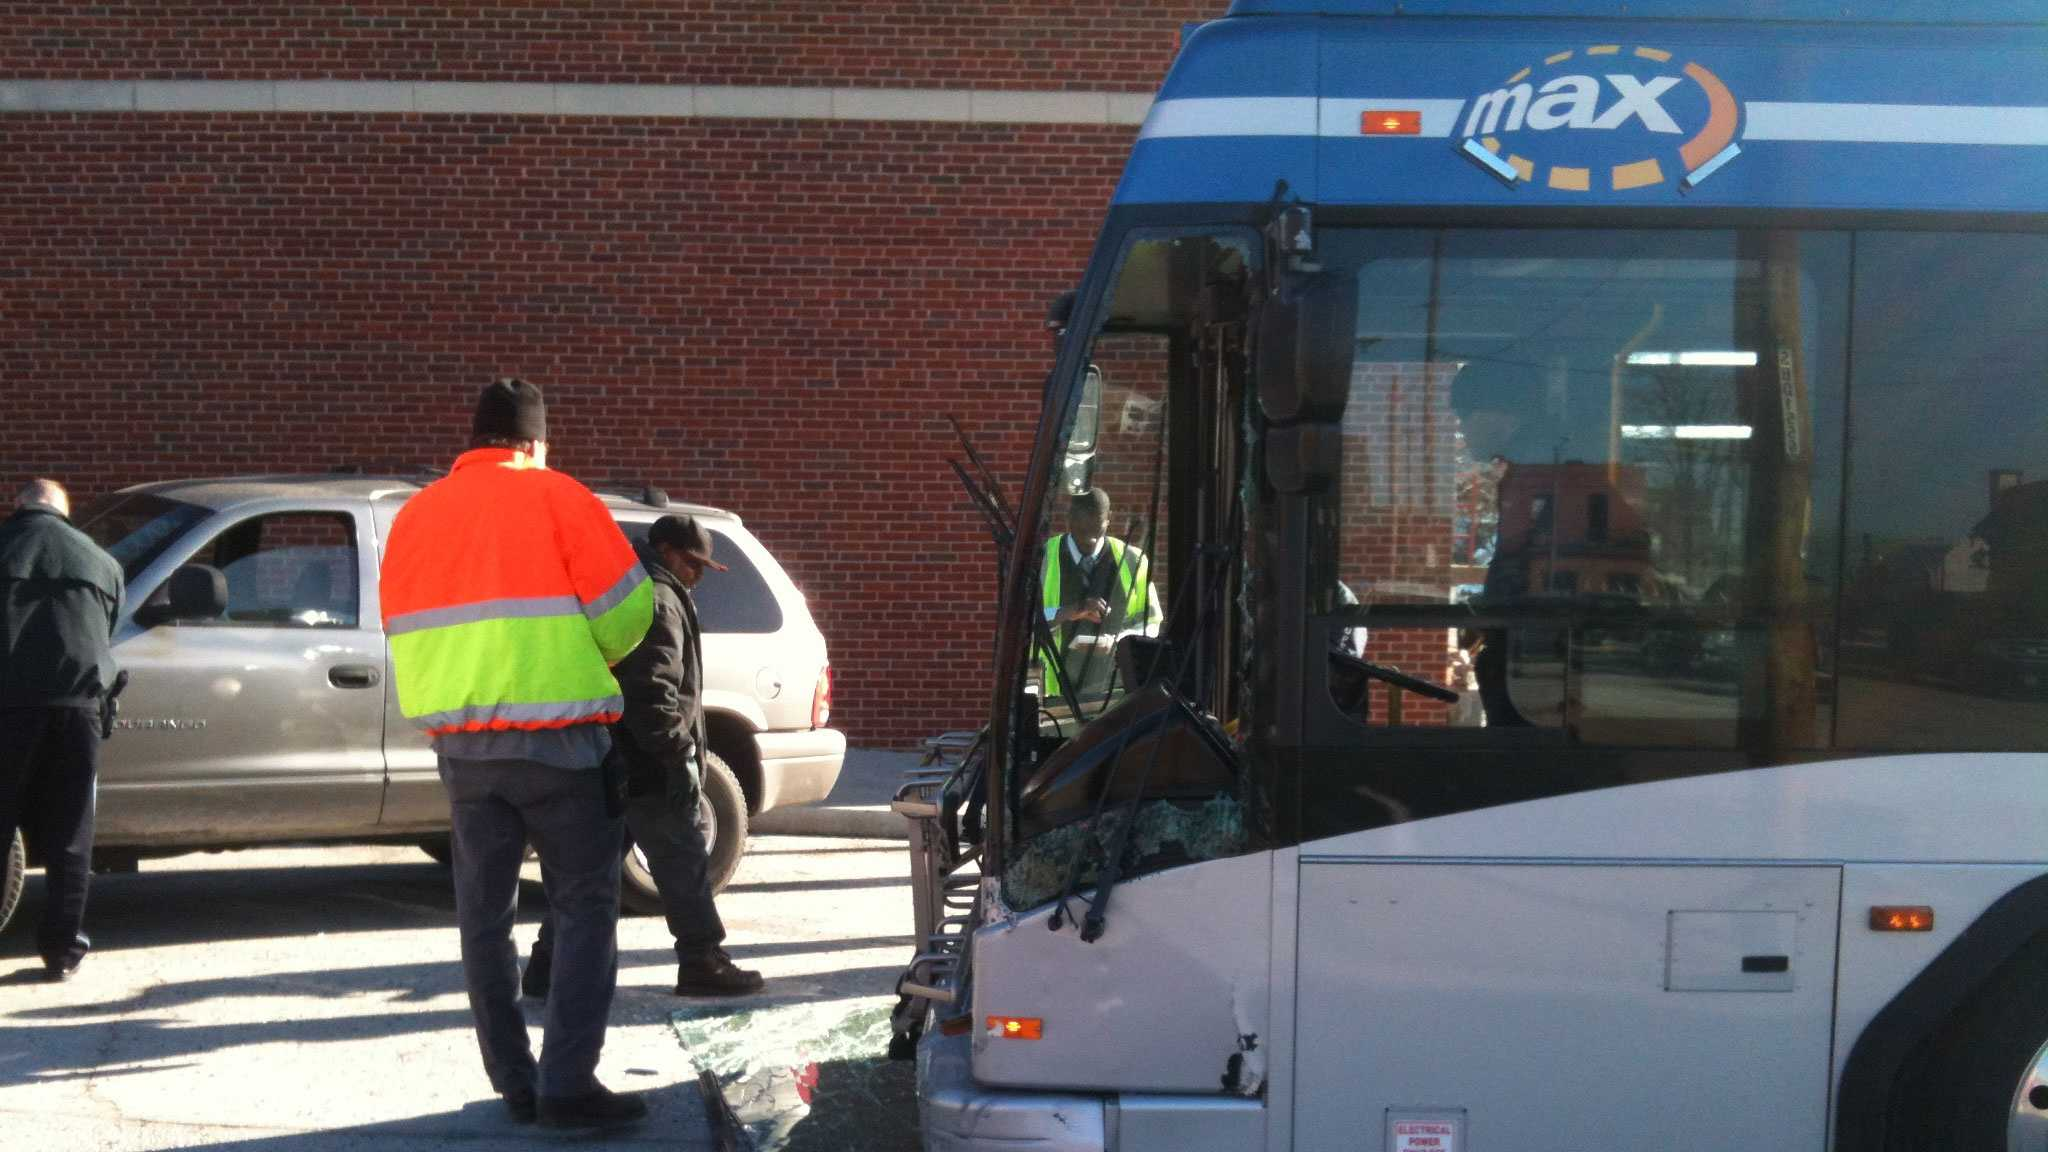 16th, Holmes bus crash